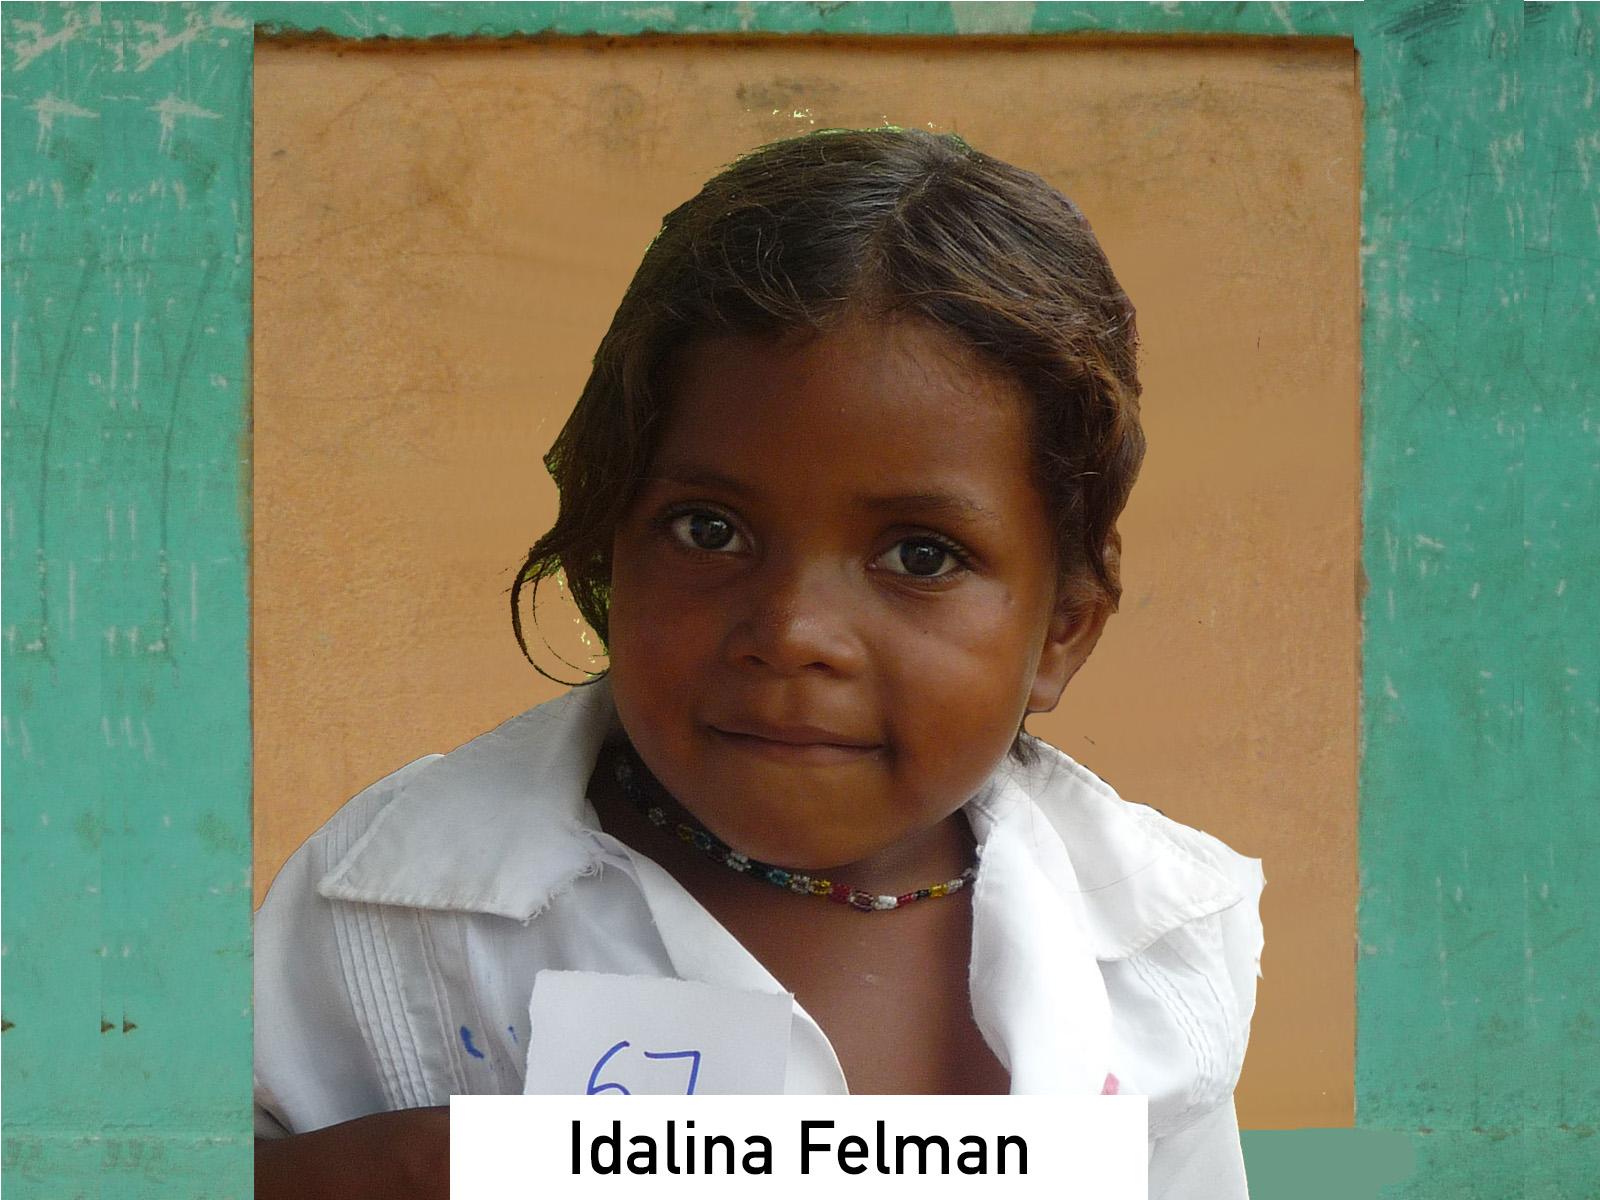 067 - Idalina Felman.jpg